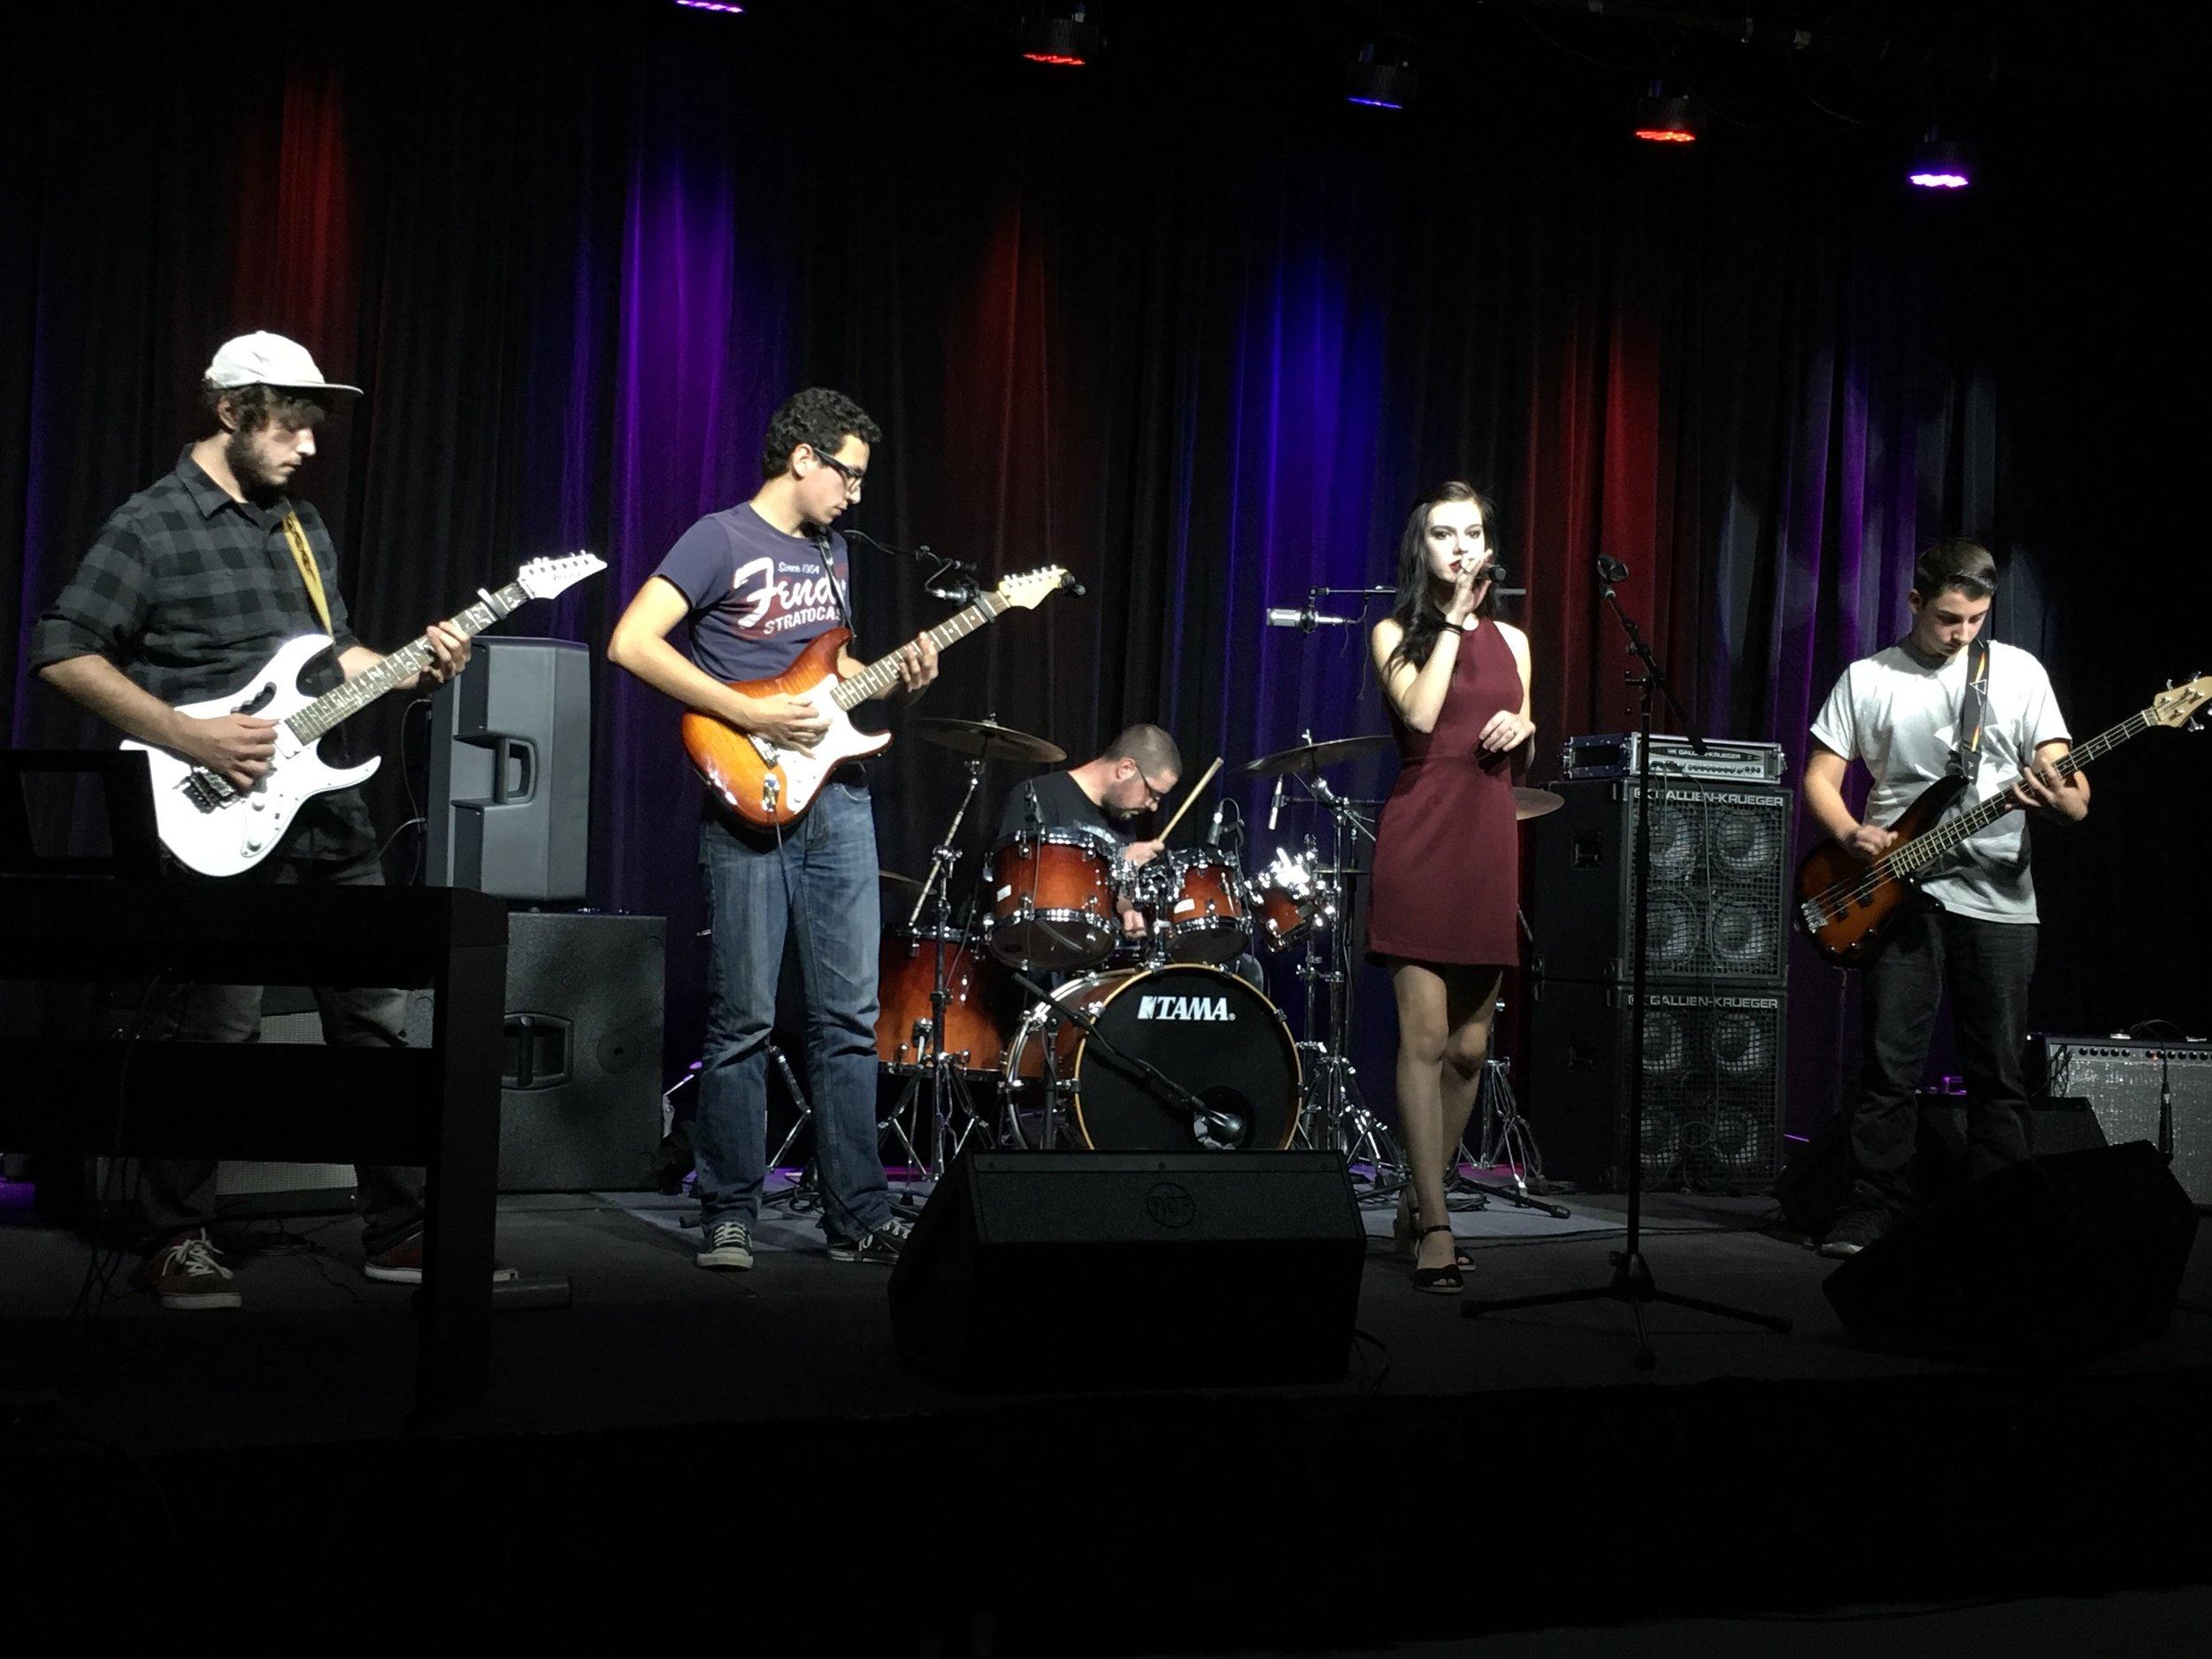 Left to Right: Tom Alessi, Matt Mangine, (Nate Richards filling in for drummer Craig John), Sam Treloar, Nick Cianci